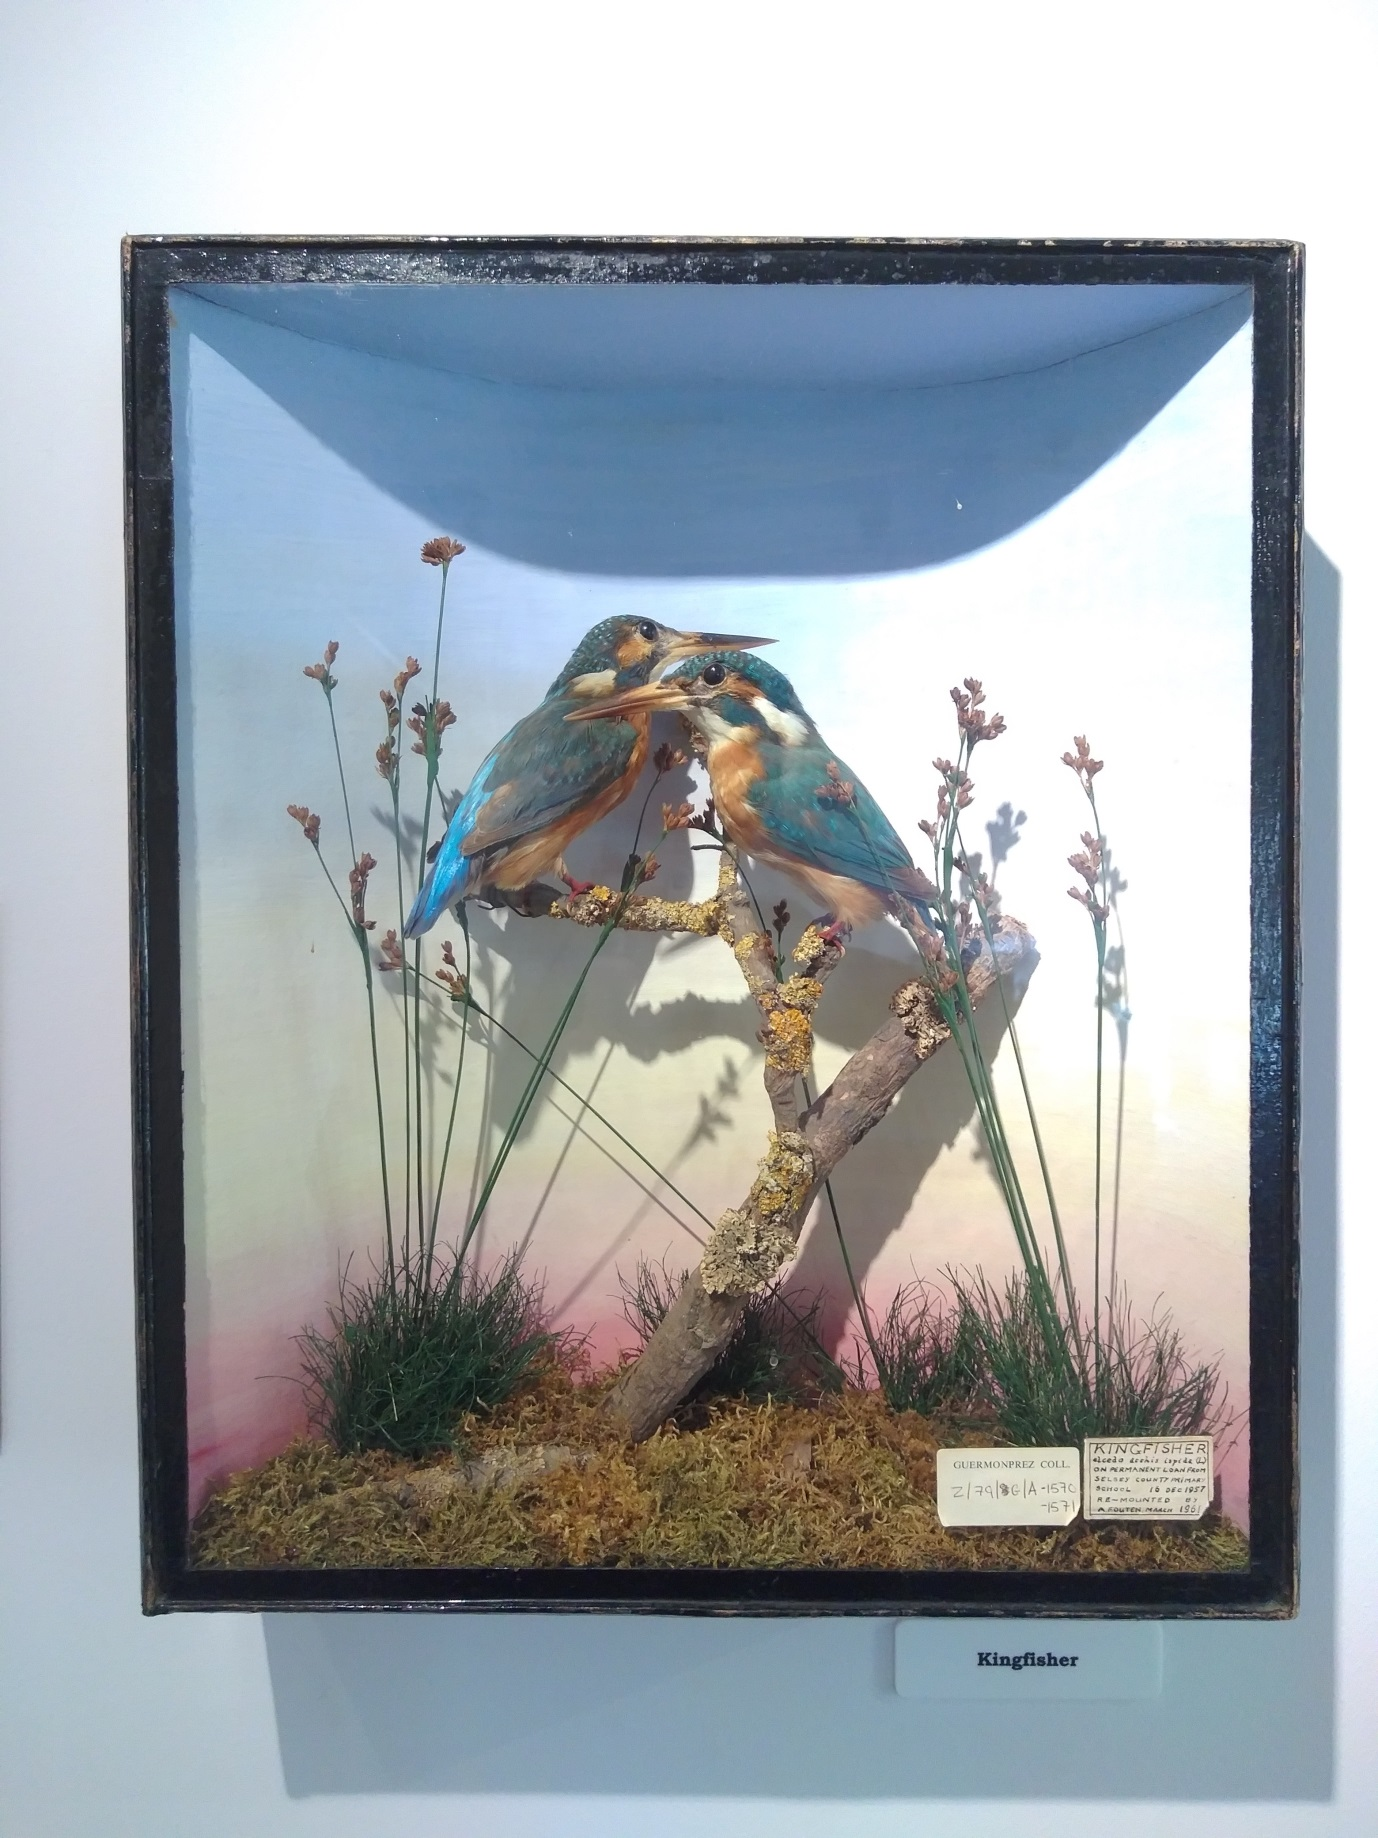 Beautiful and iridescent kingfisher display.